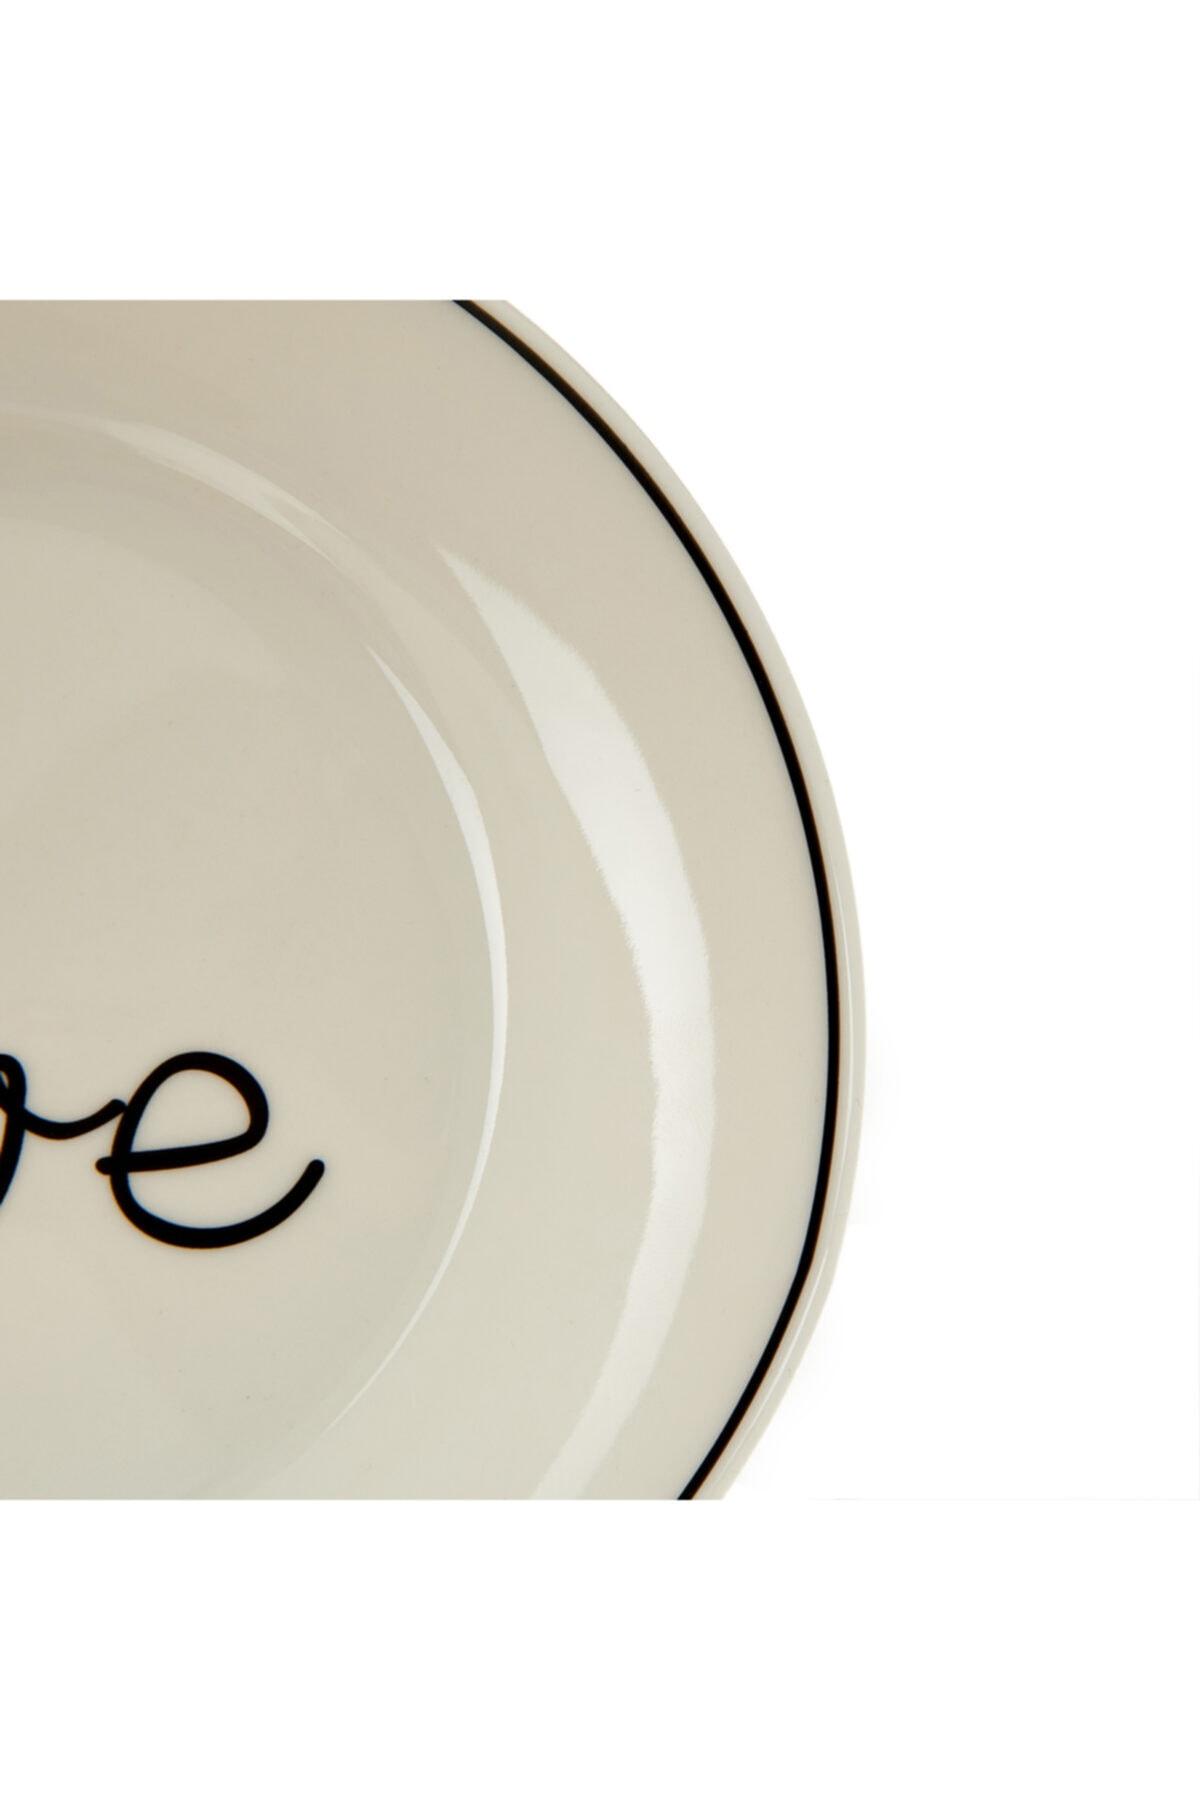 Porland Lfh Hope Love Tatlı Tabağı - 17 Cm 2